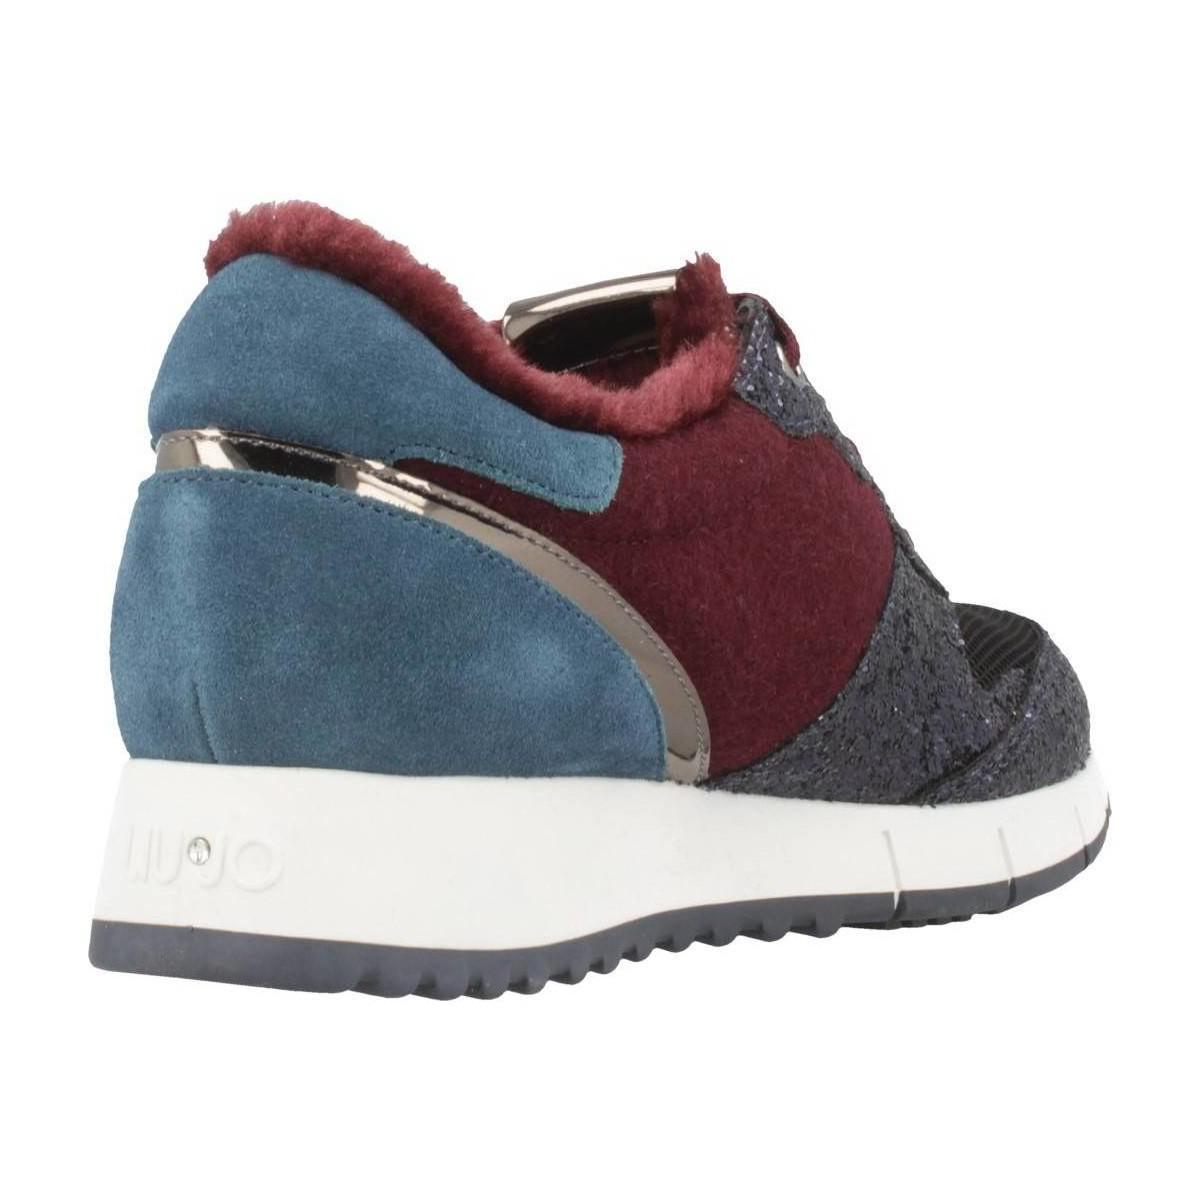 Chaussures Femmes Gigi Lyst Liu Multicolor En Jo qw8OEC0